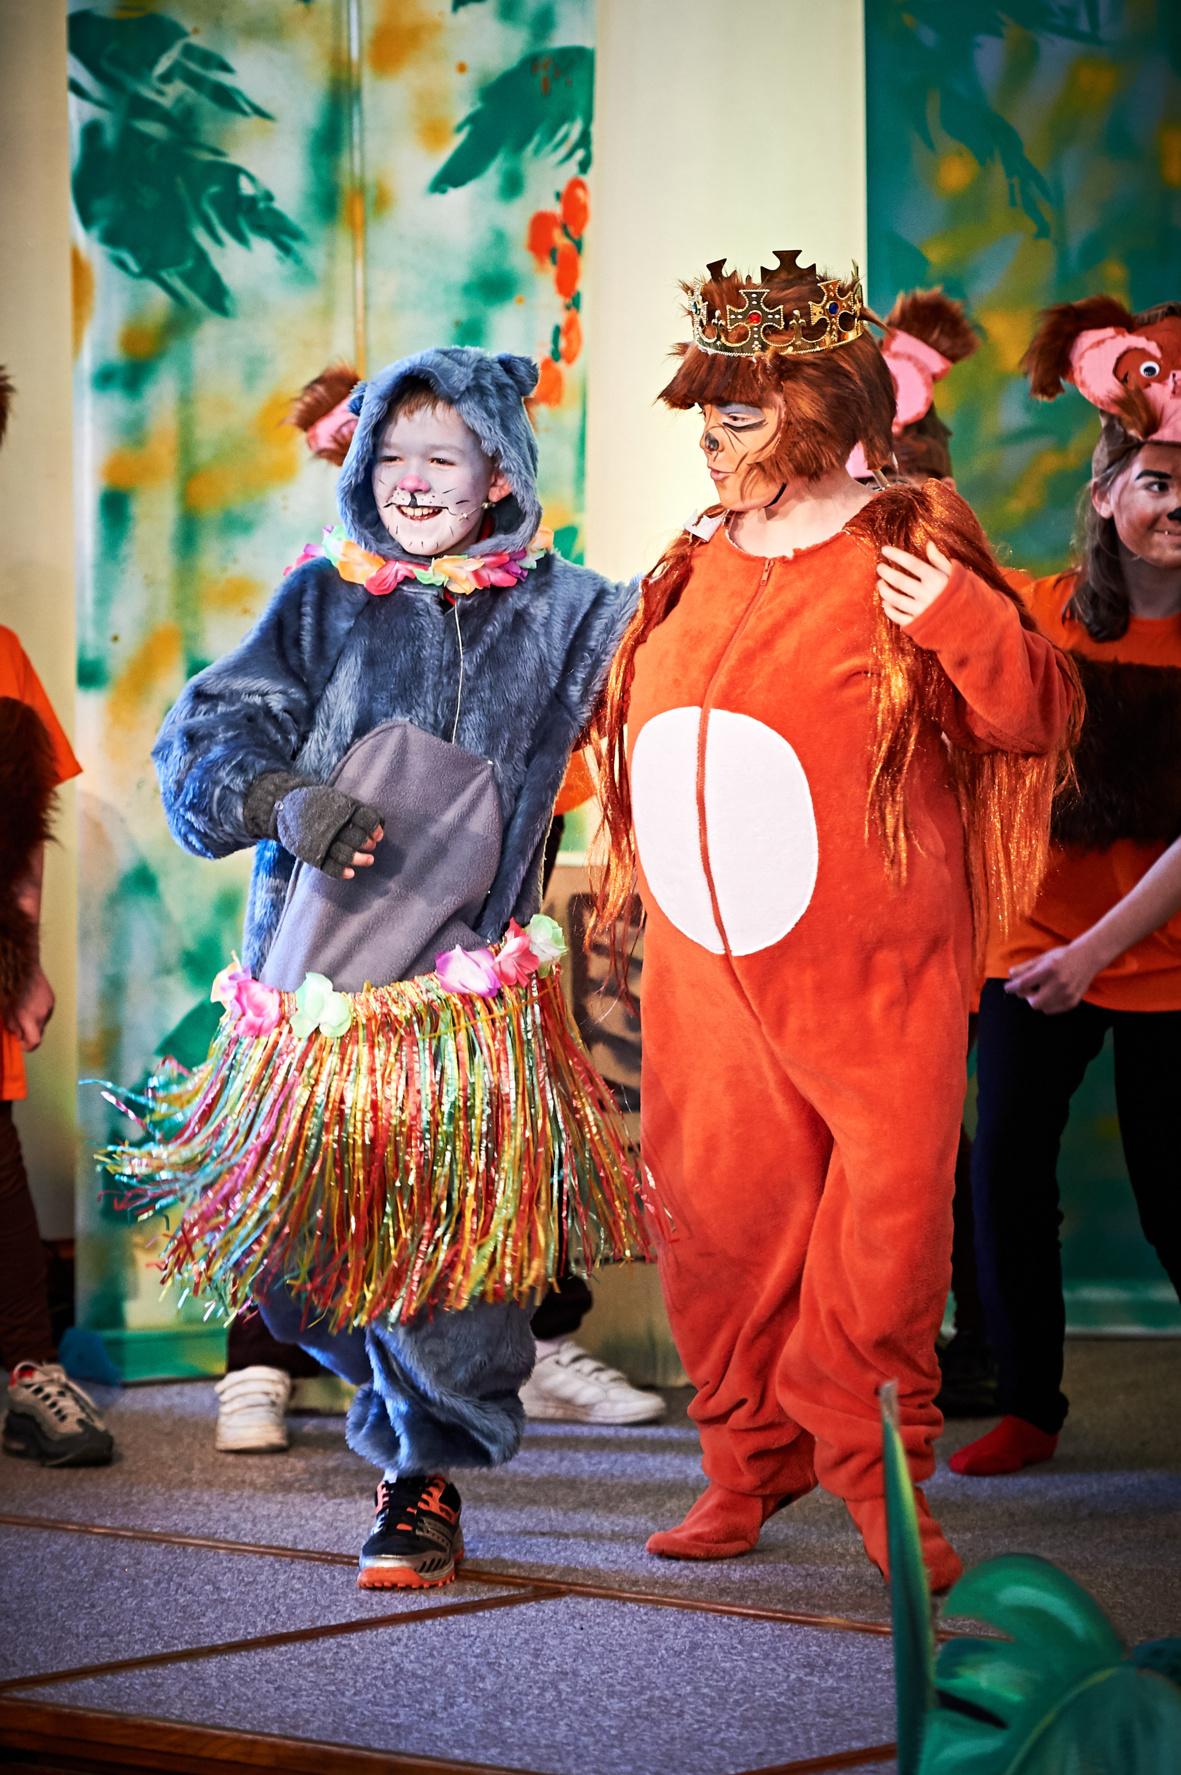 Maldon Court Prep school - Learning - Singing - School photography - Drama - Acting